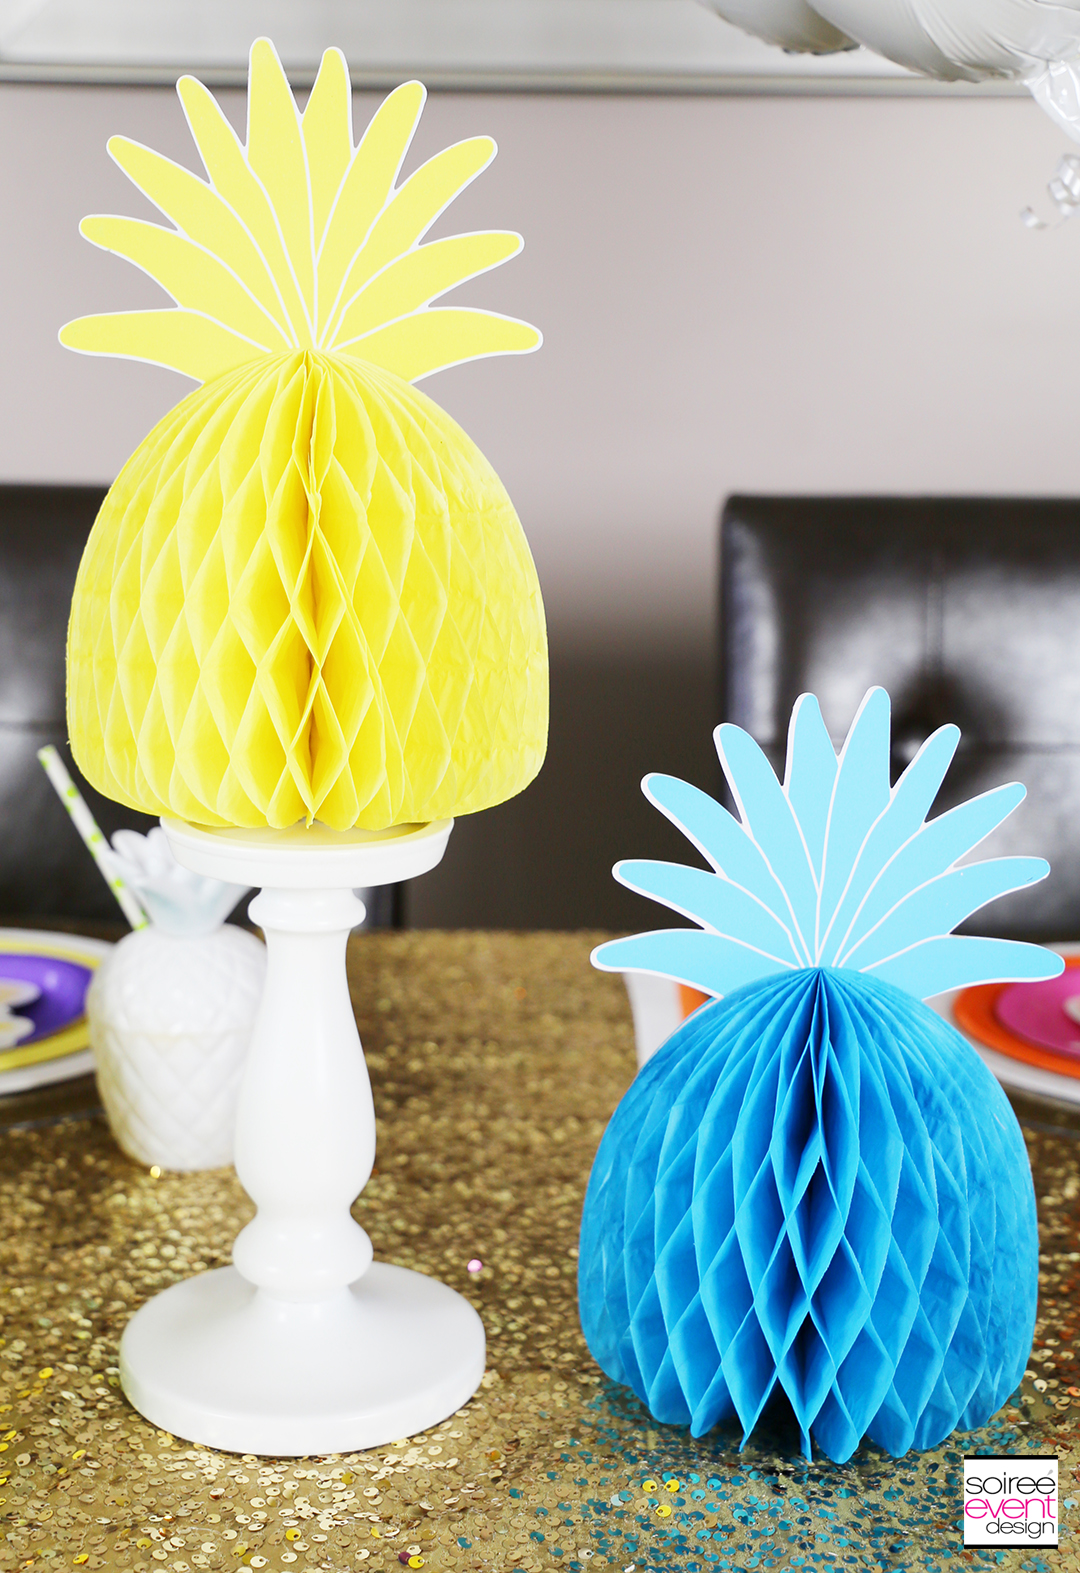 Rainbow Party Ideas - Pineapple Rainbow Party Tablescape 8